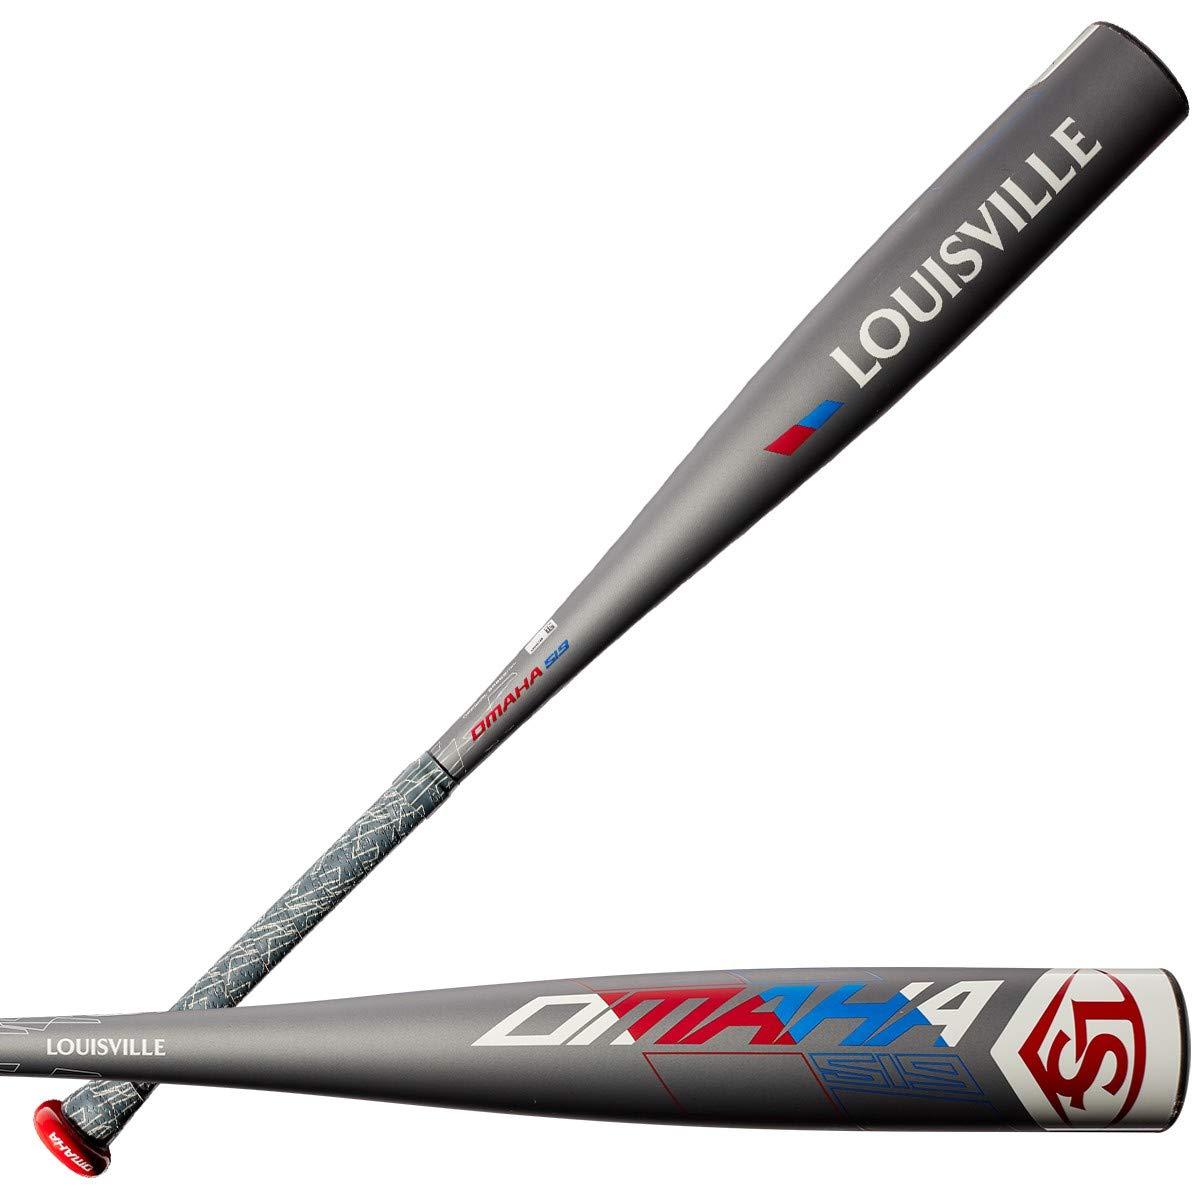 louisville-slugger-2019-omaha-519-5-2-5-8-senior-league-baseball-bat-30-inch-25-oz WTLSLO519B530 Louisville 887768729936 Meets USSSA 1.15 bpf standard; 7/8 inch tapered handle 1-piece ST